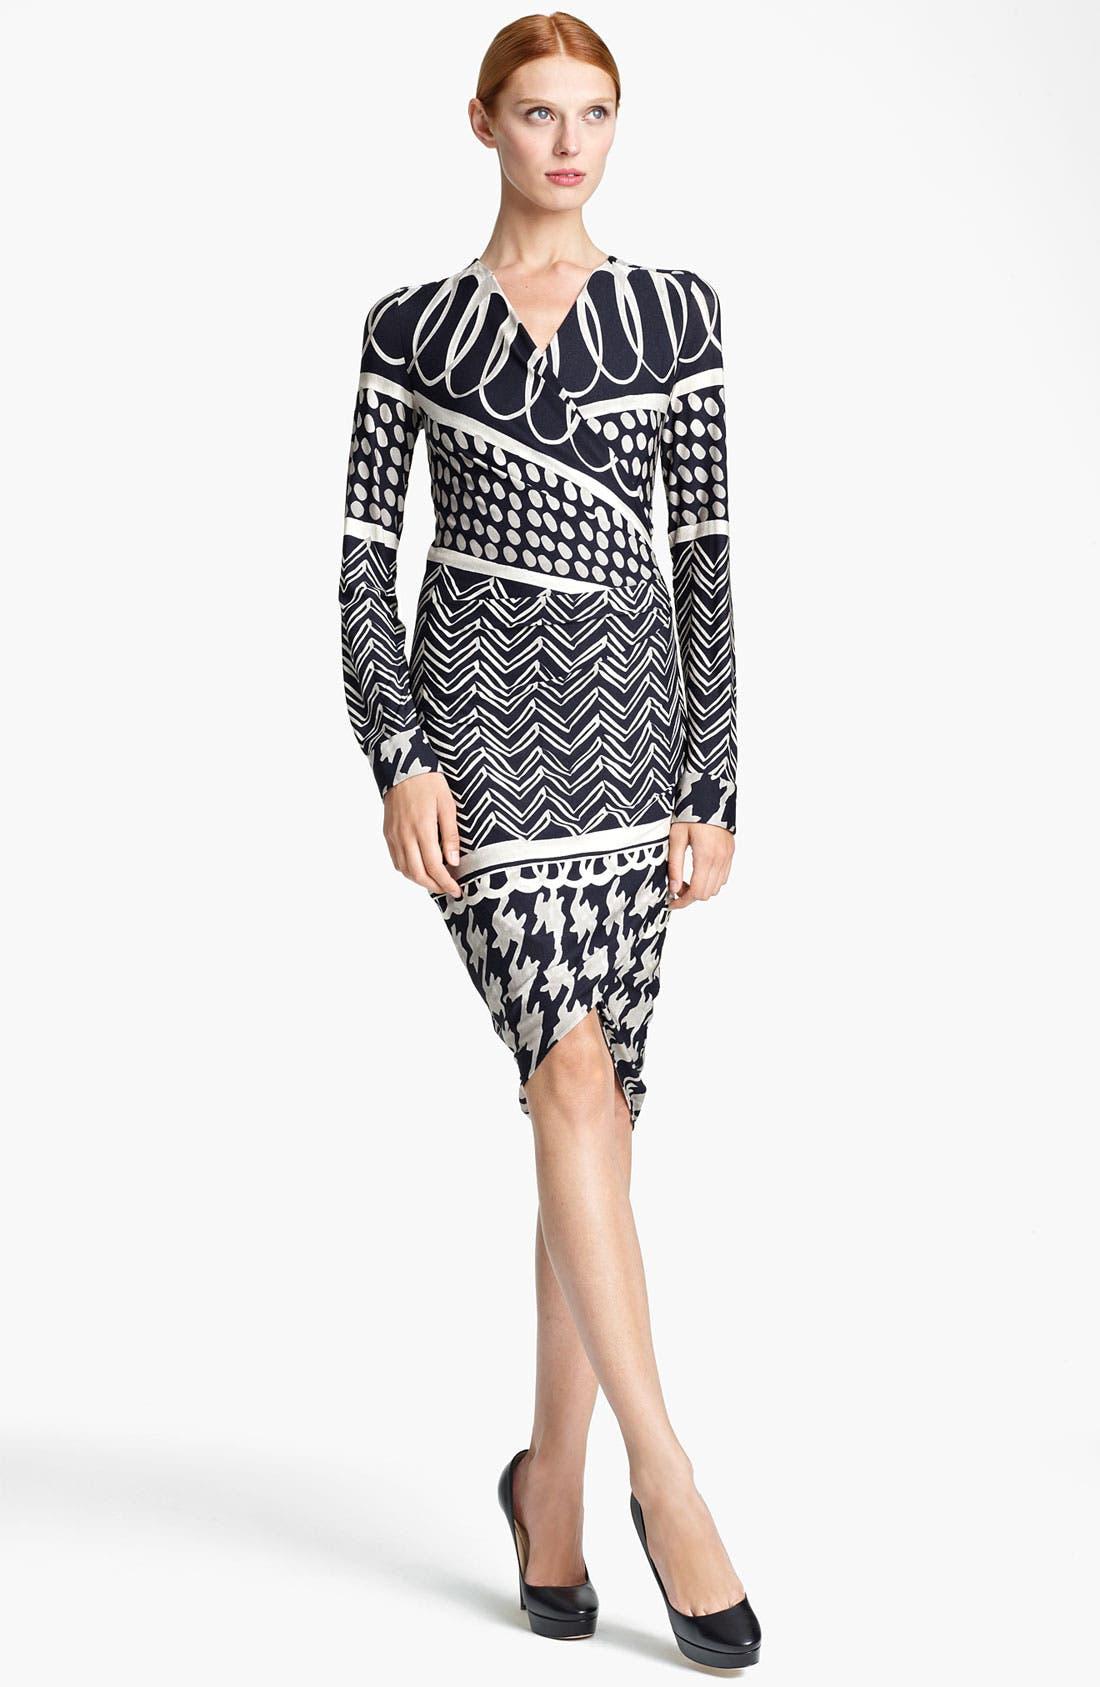 Main Image - Max Mara 'Eneide' Print Jersey Dress